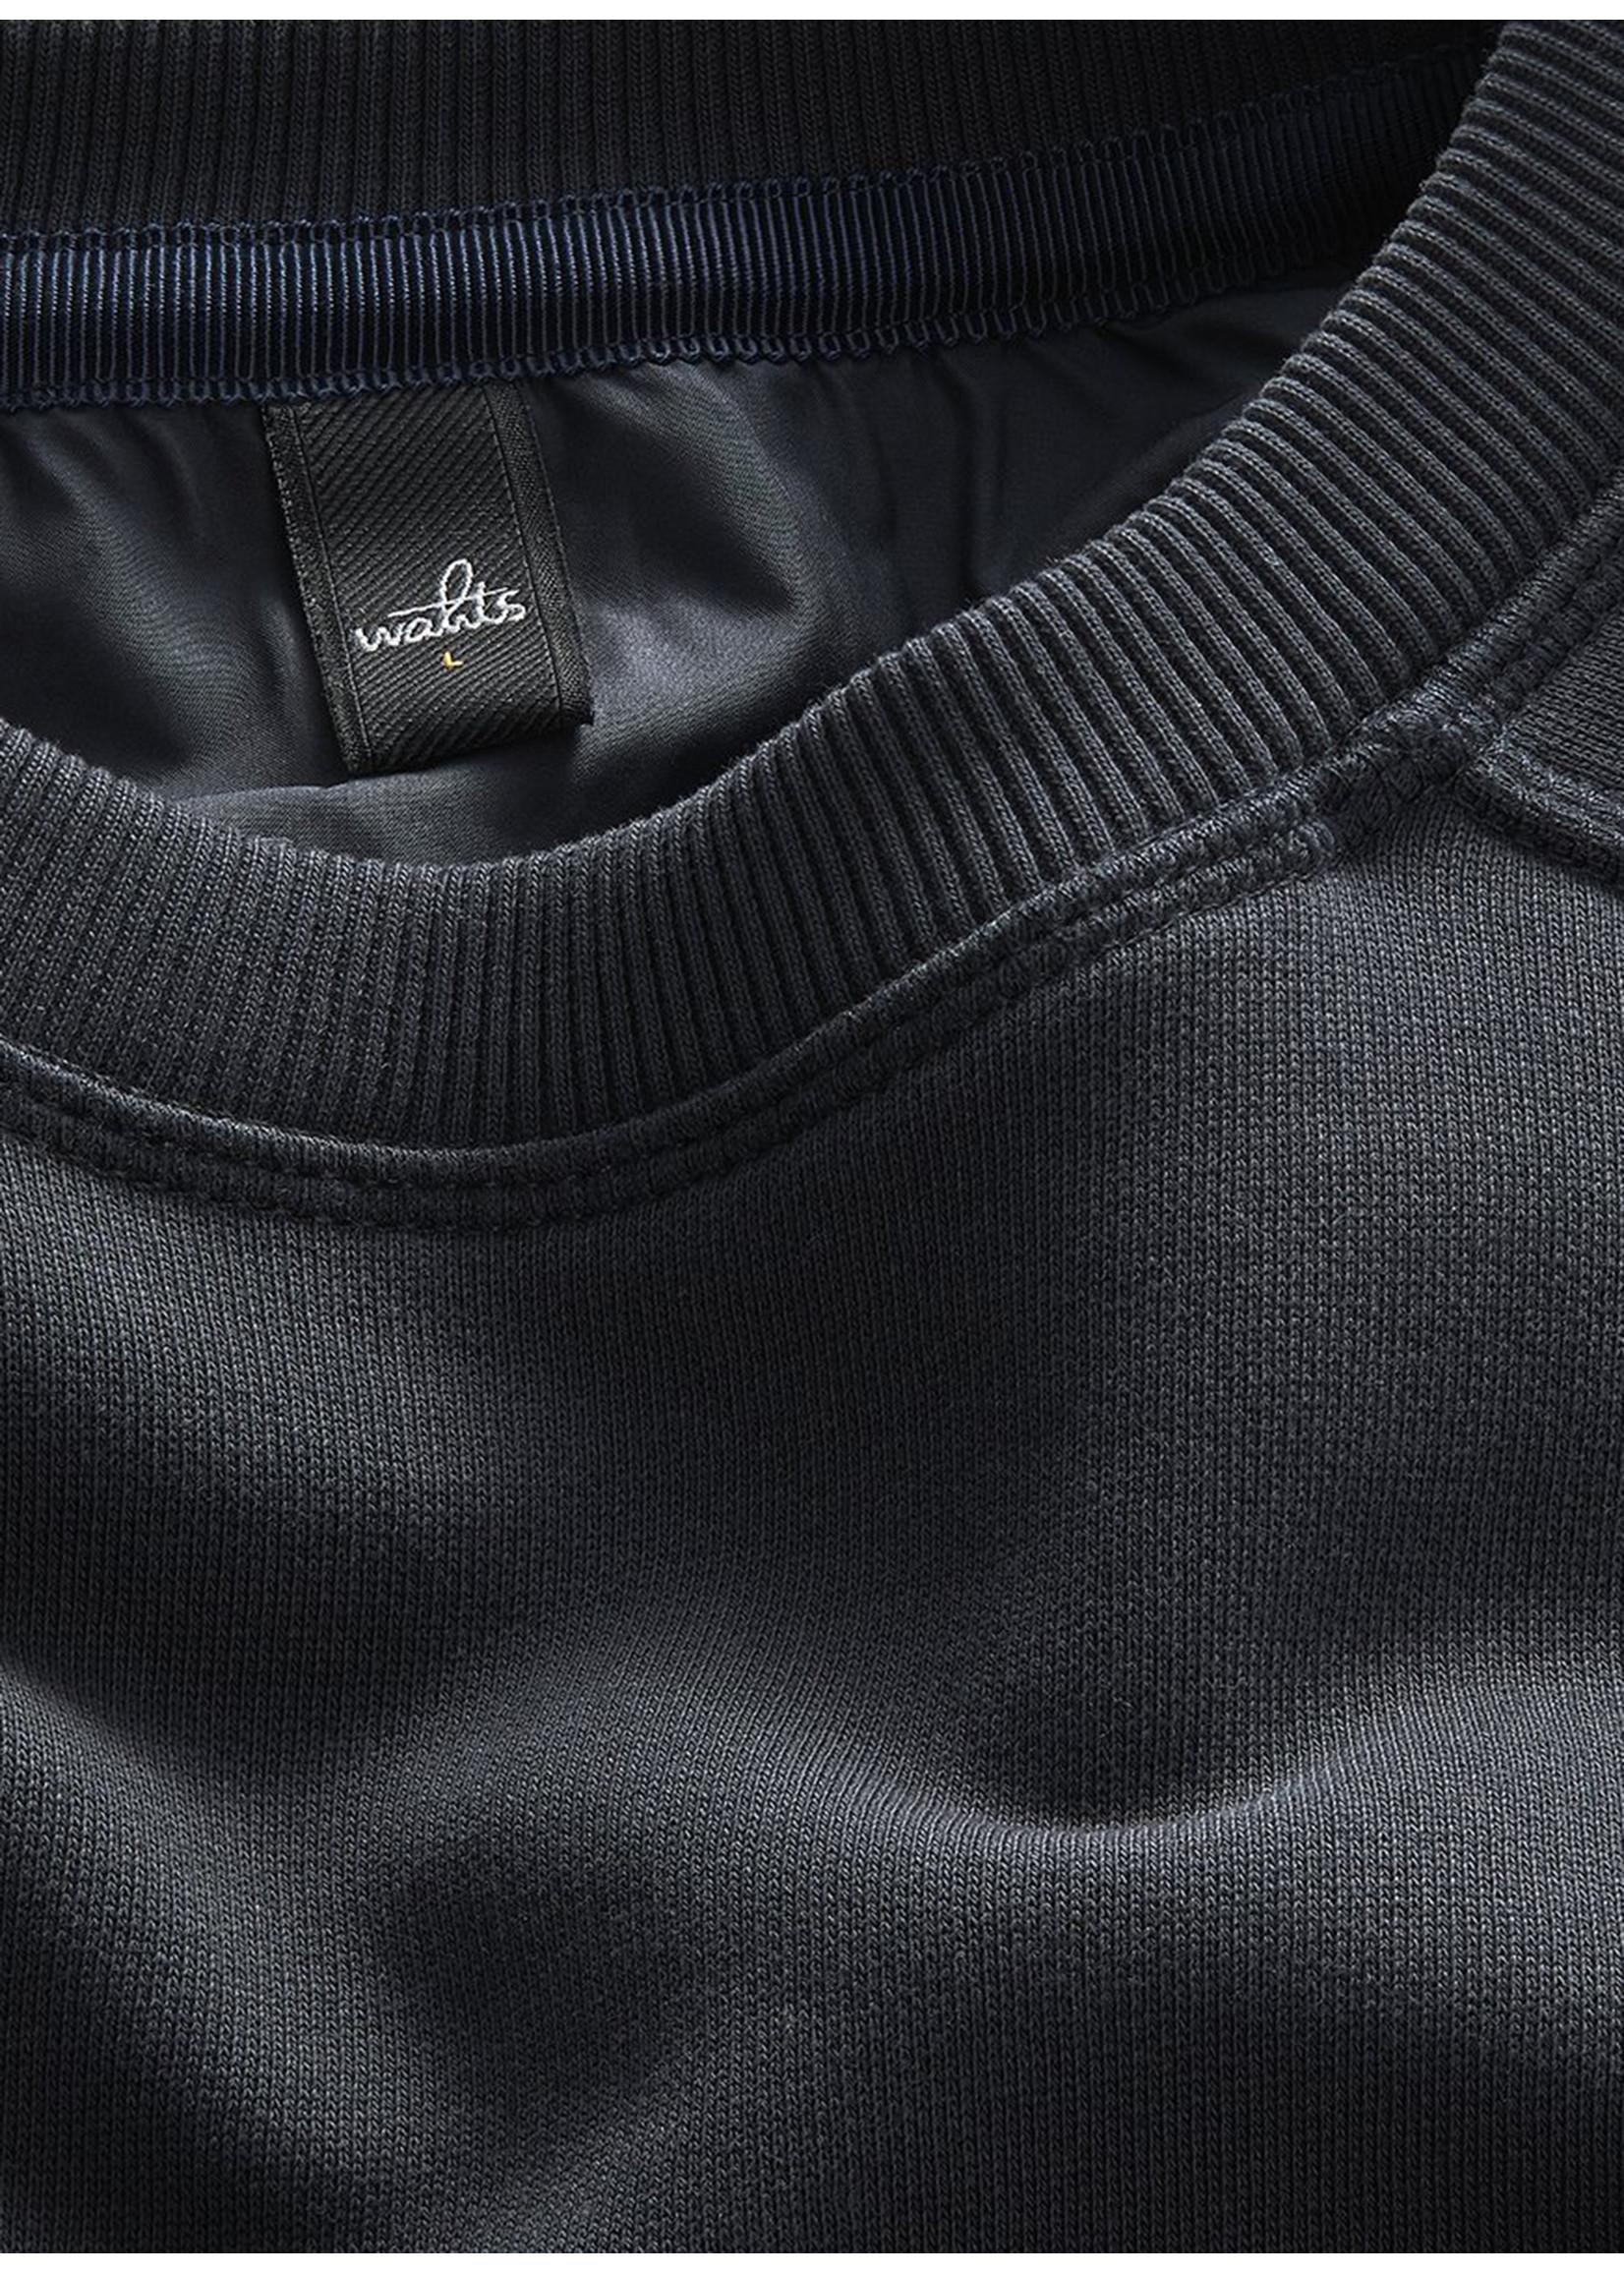 Wahts Moore crewneck sweater dark navy